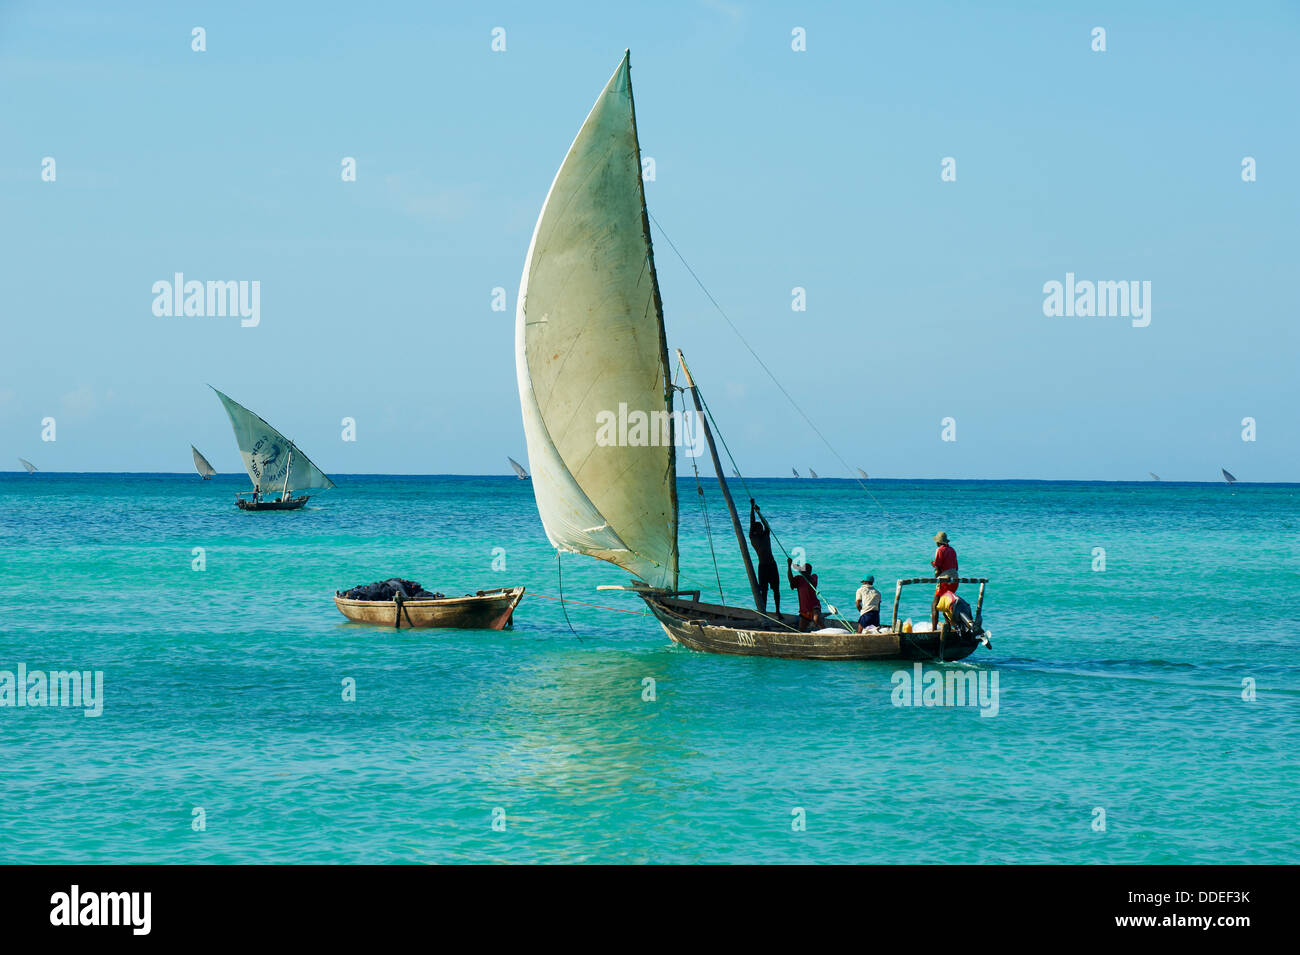 Tanzania, Zanzibar island, Unguja, fishing boat at Nungwi - Stock Image